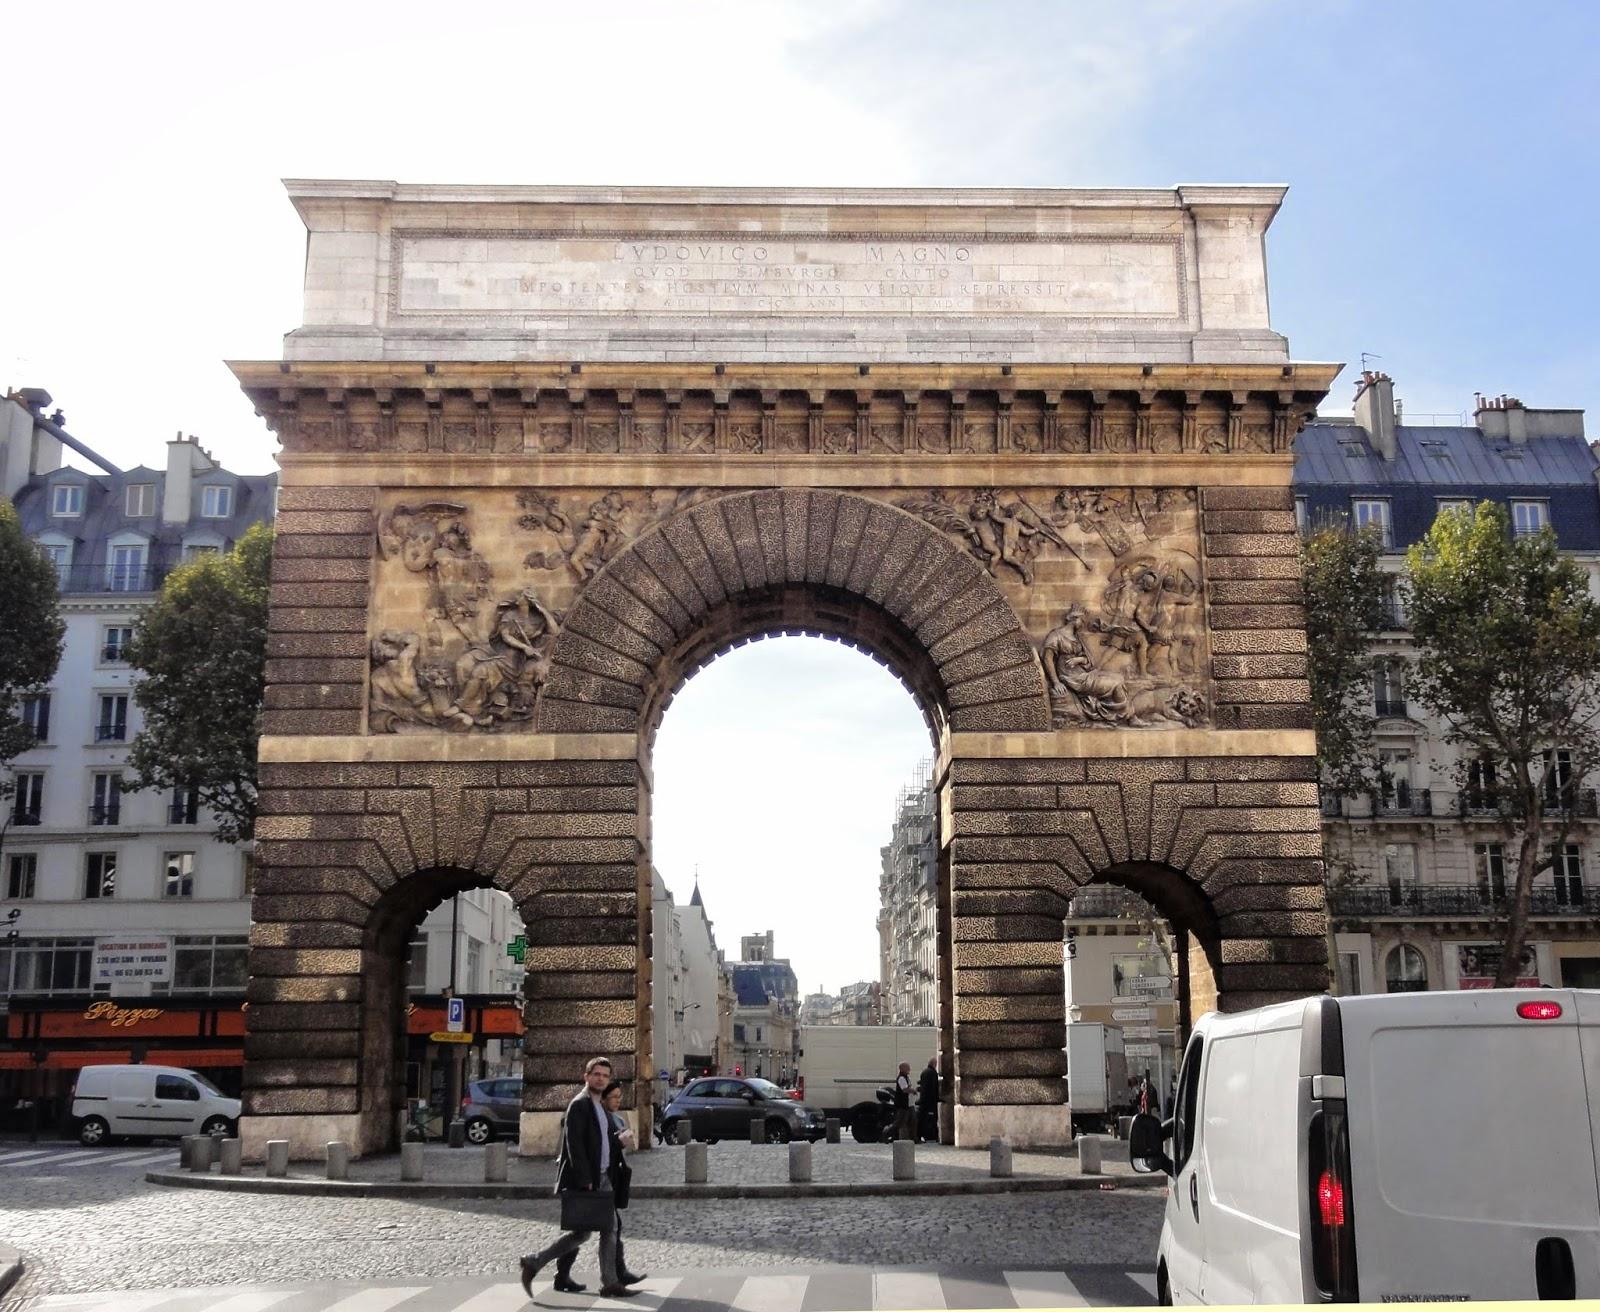 Porte saint martin paris historic walks for Porte saint martin